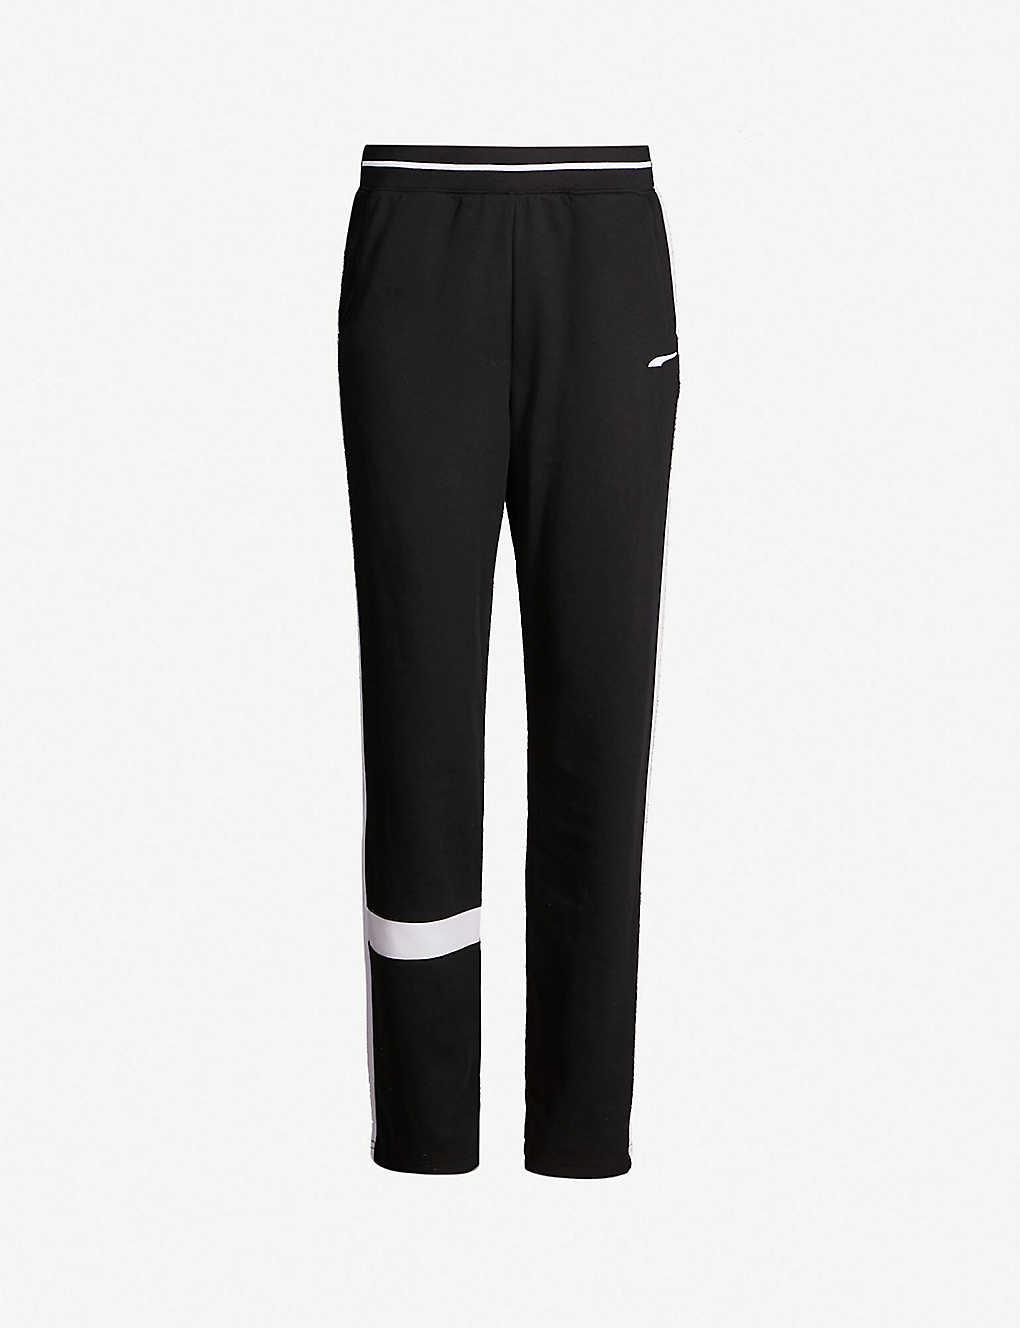 d3a17f9b13f4 PUMA X ADER ERROR - Embroidered-logo cotton-blend track pants ...